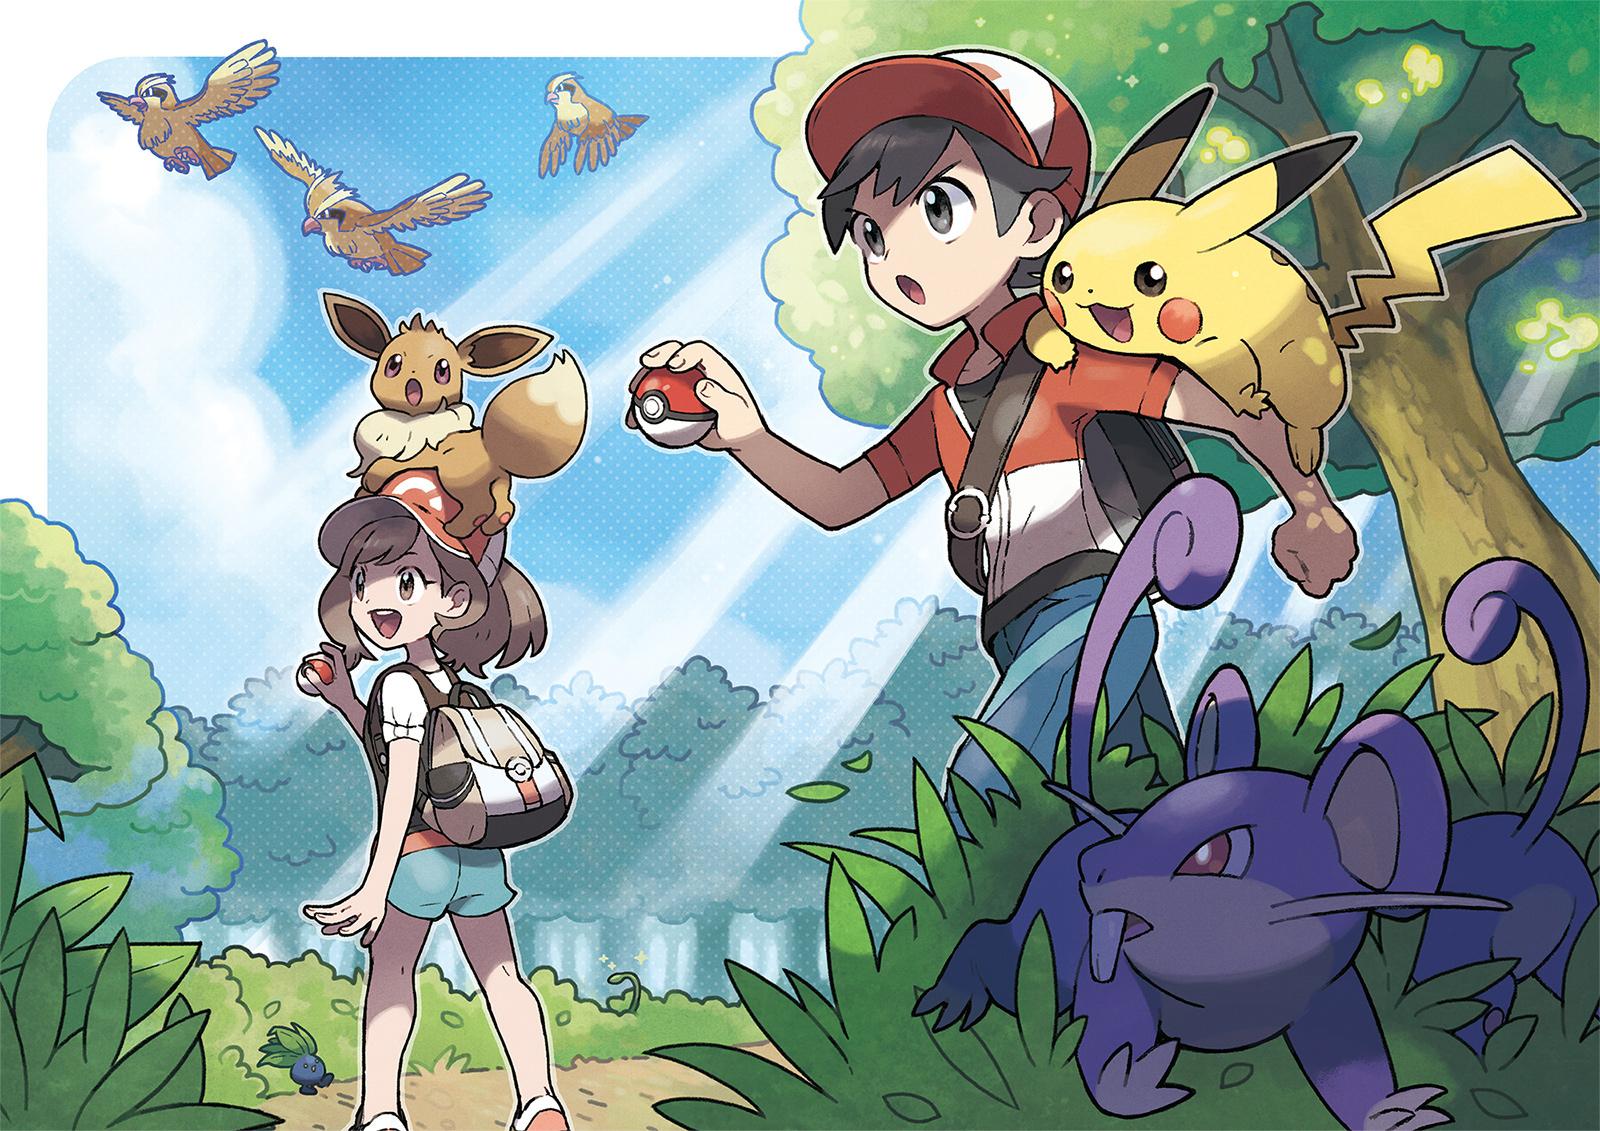 Here's how to spot shiny Pokemon in the Pokemon: Let's Go games screenshot